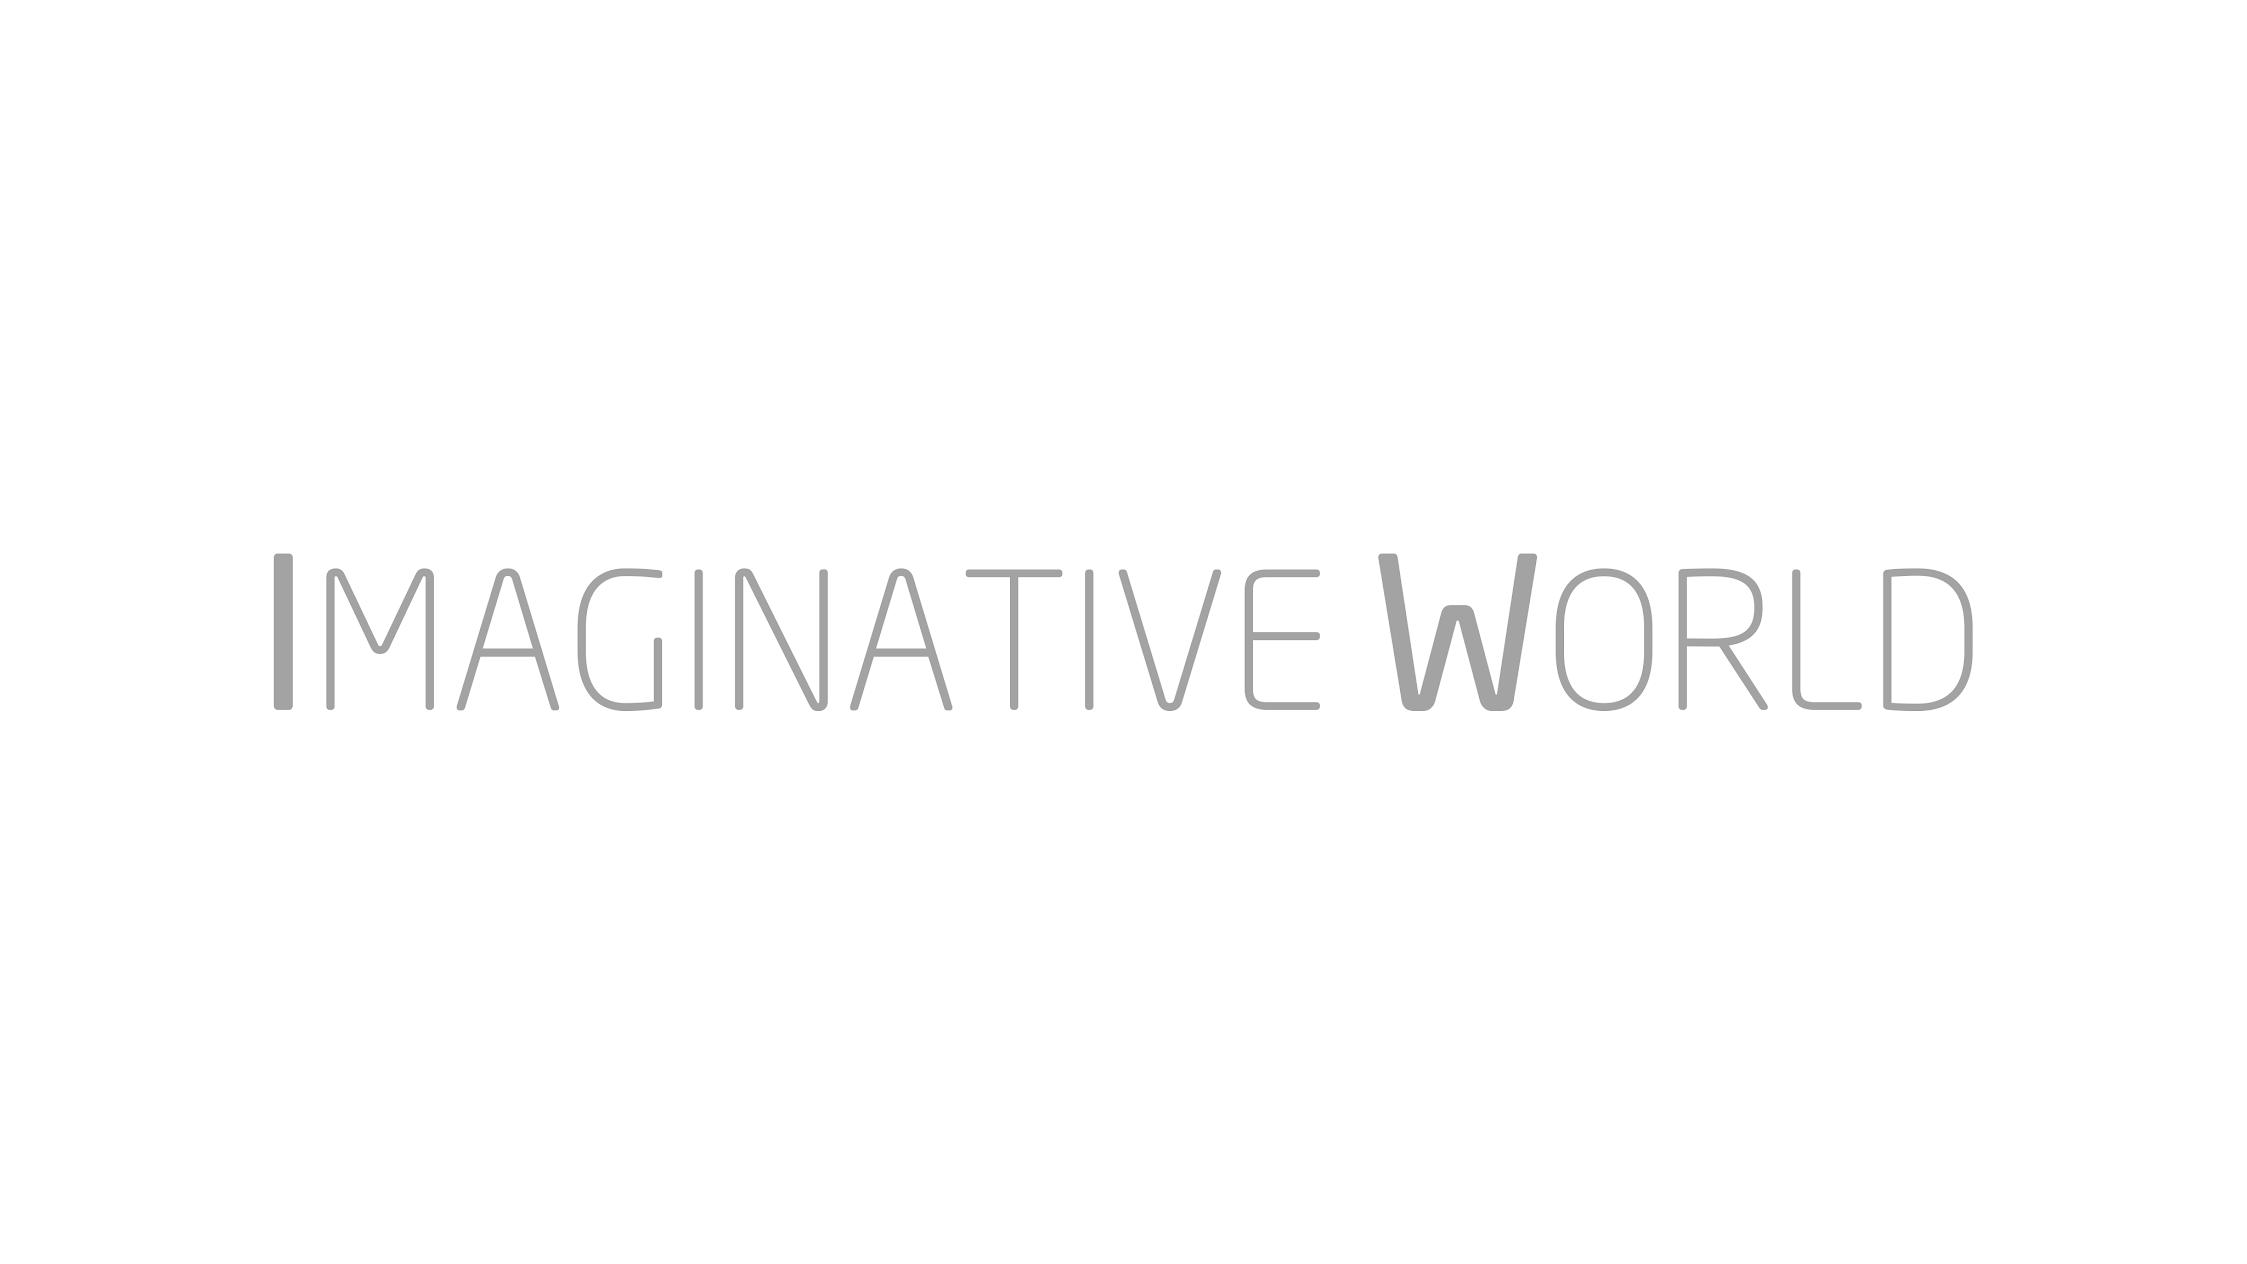 Imaginative World